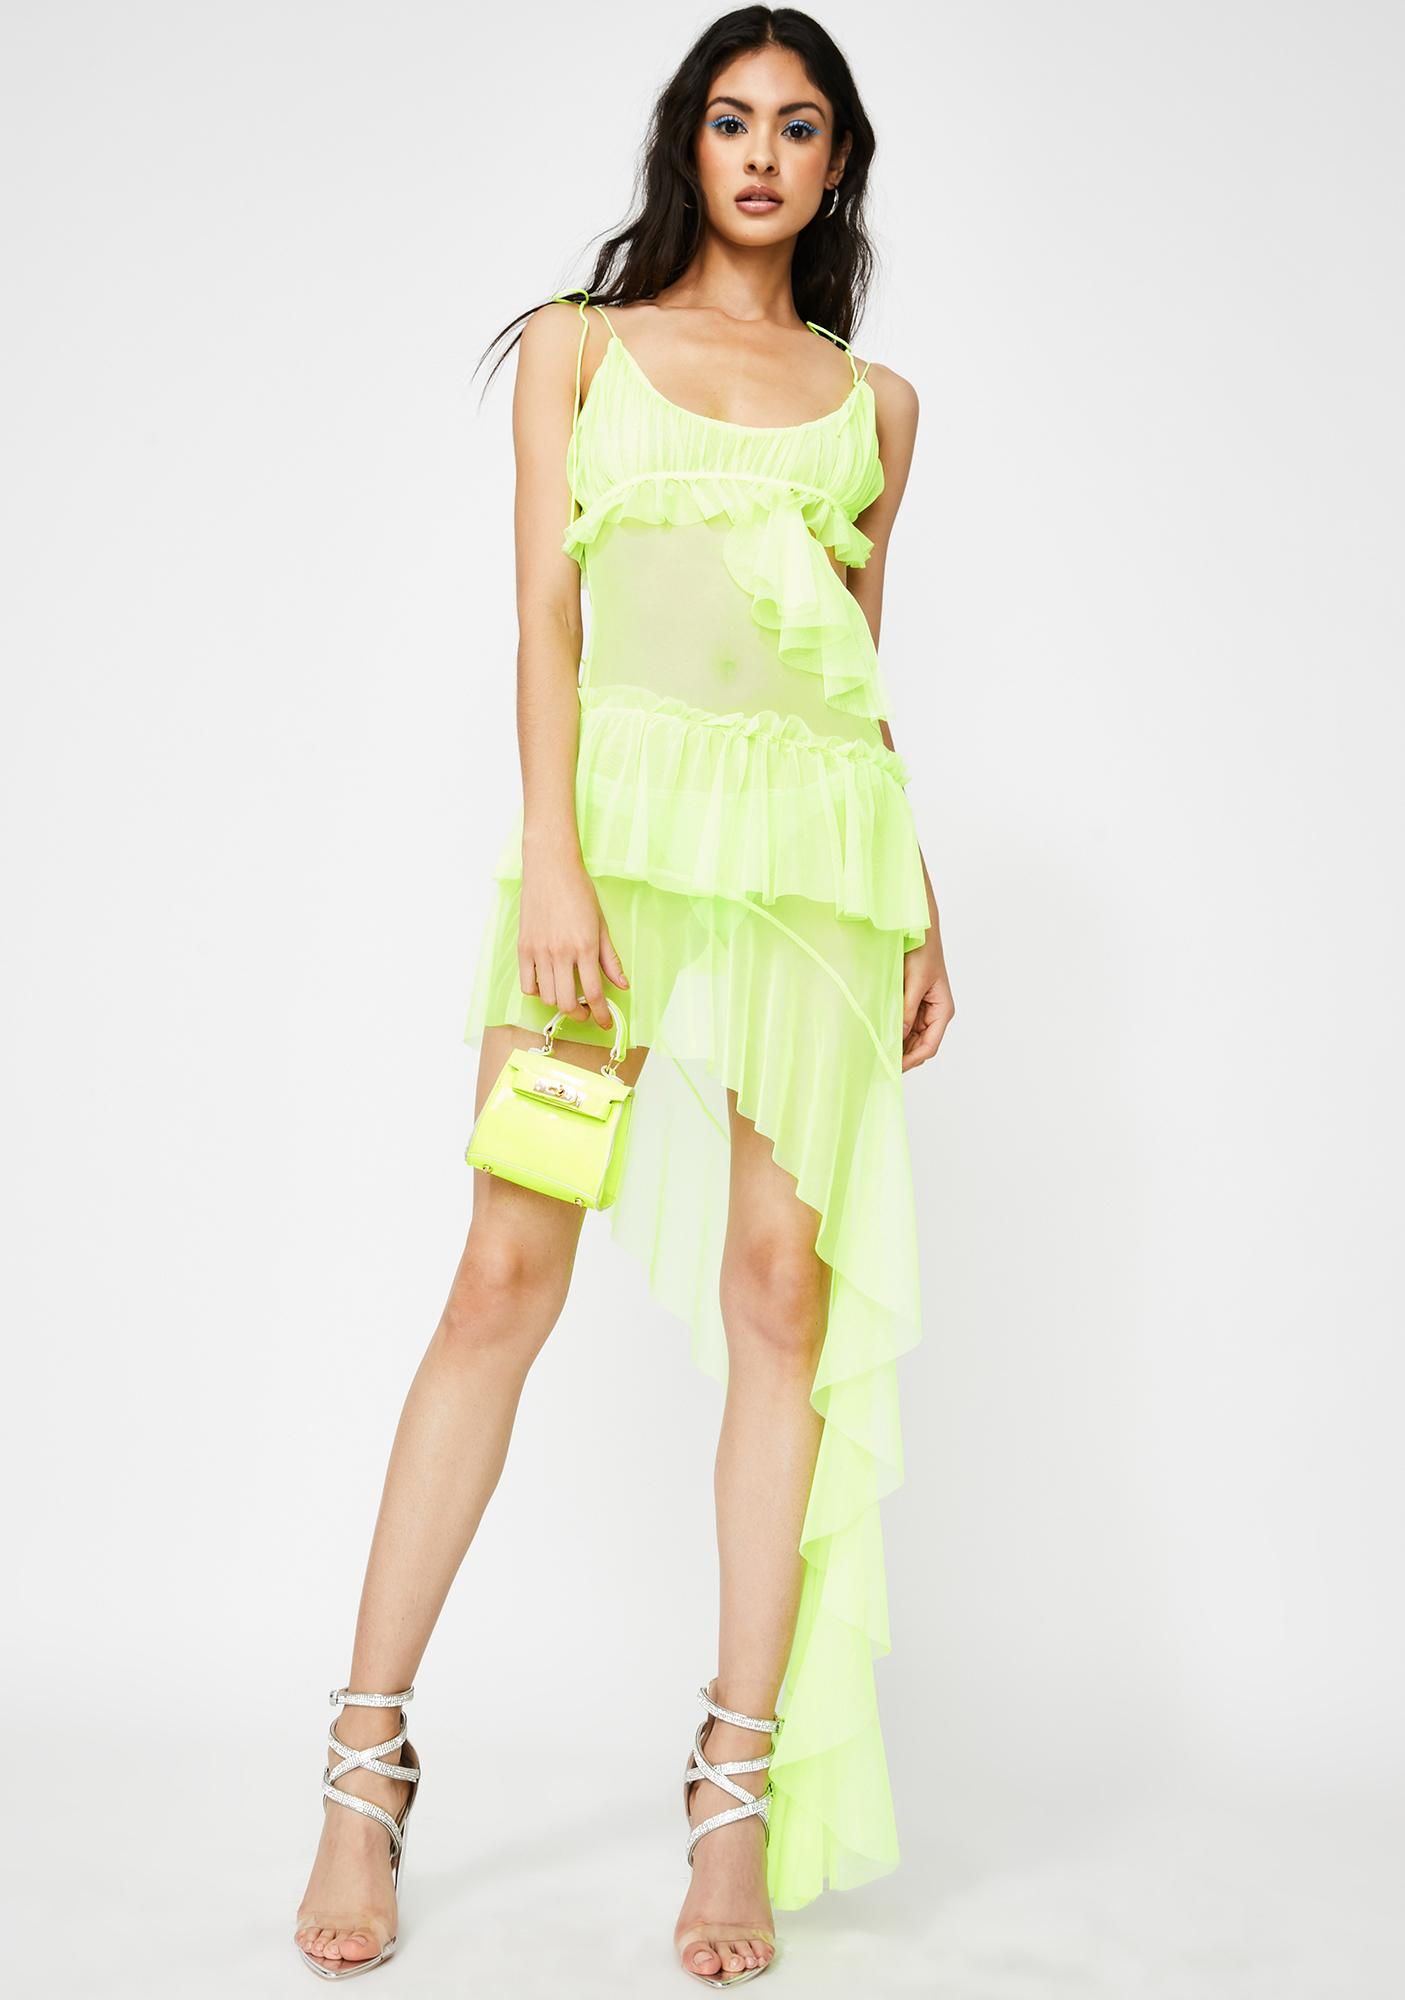 Kiki Riki Atomic Fantasy Affair Asymmetrical Dress